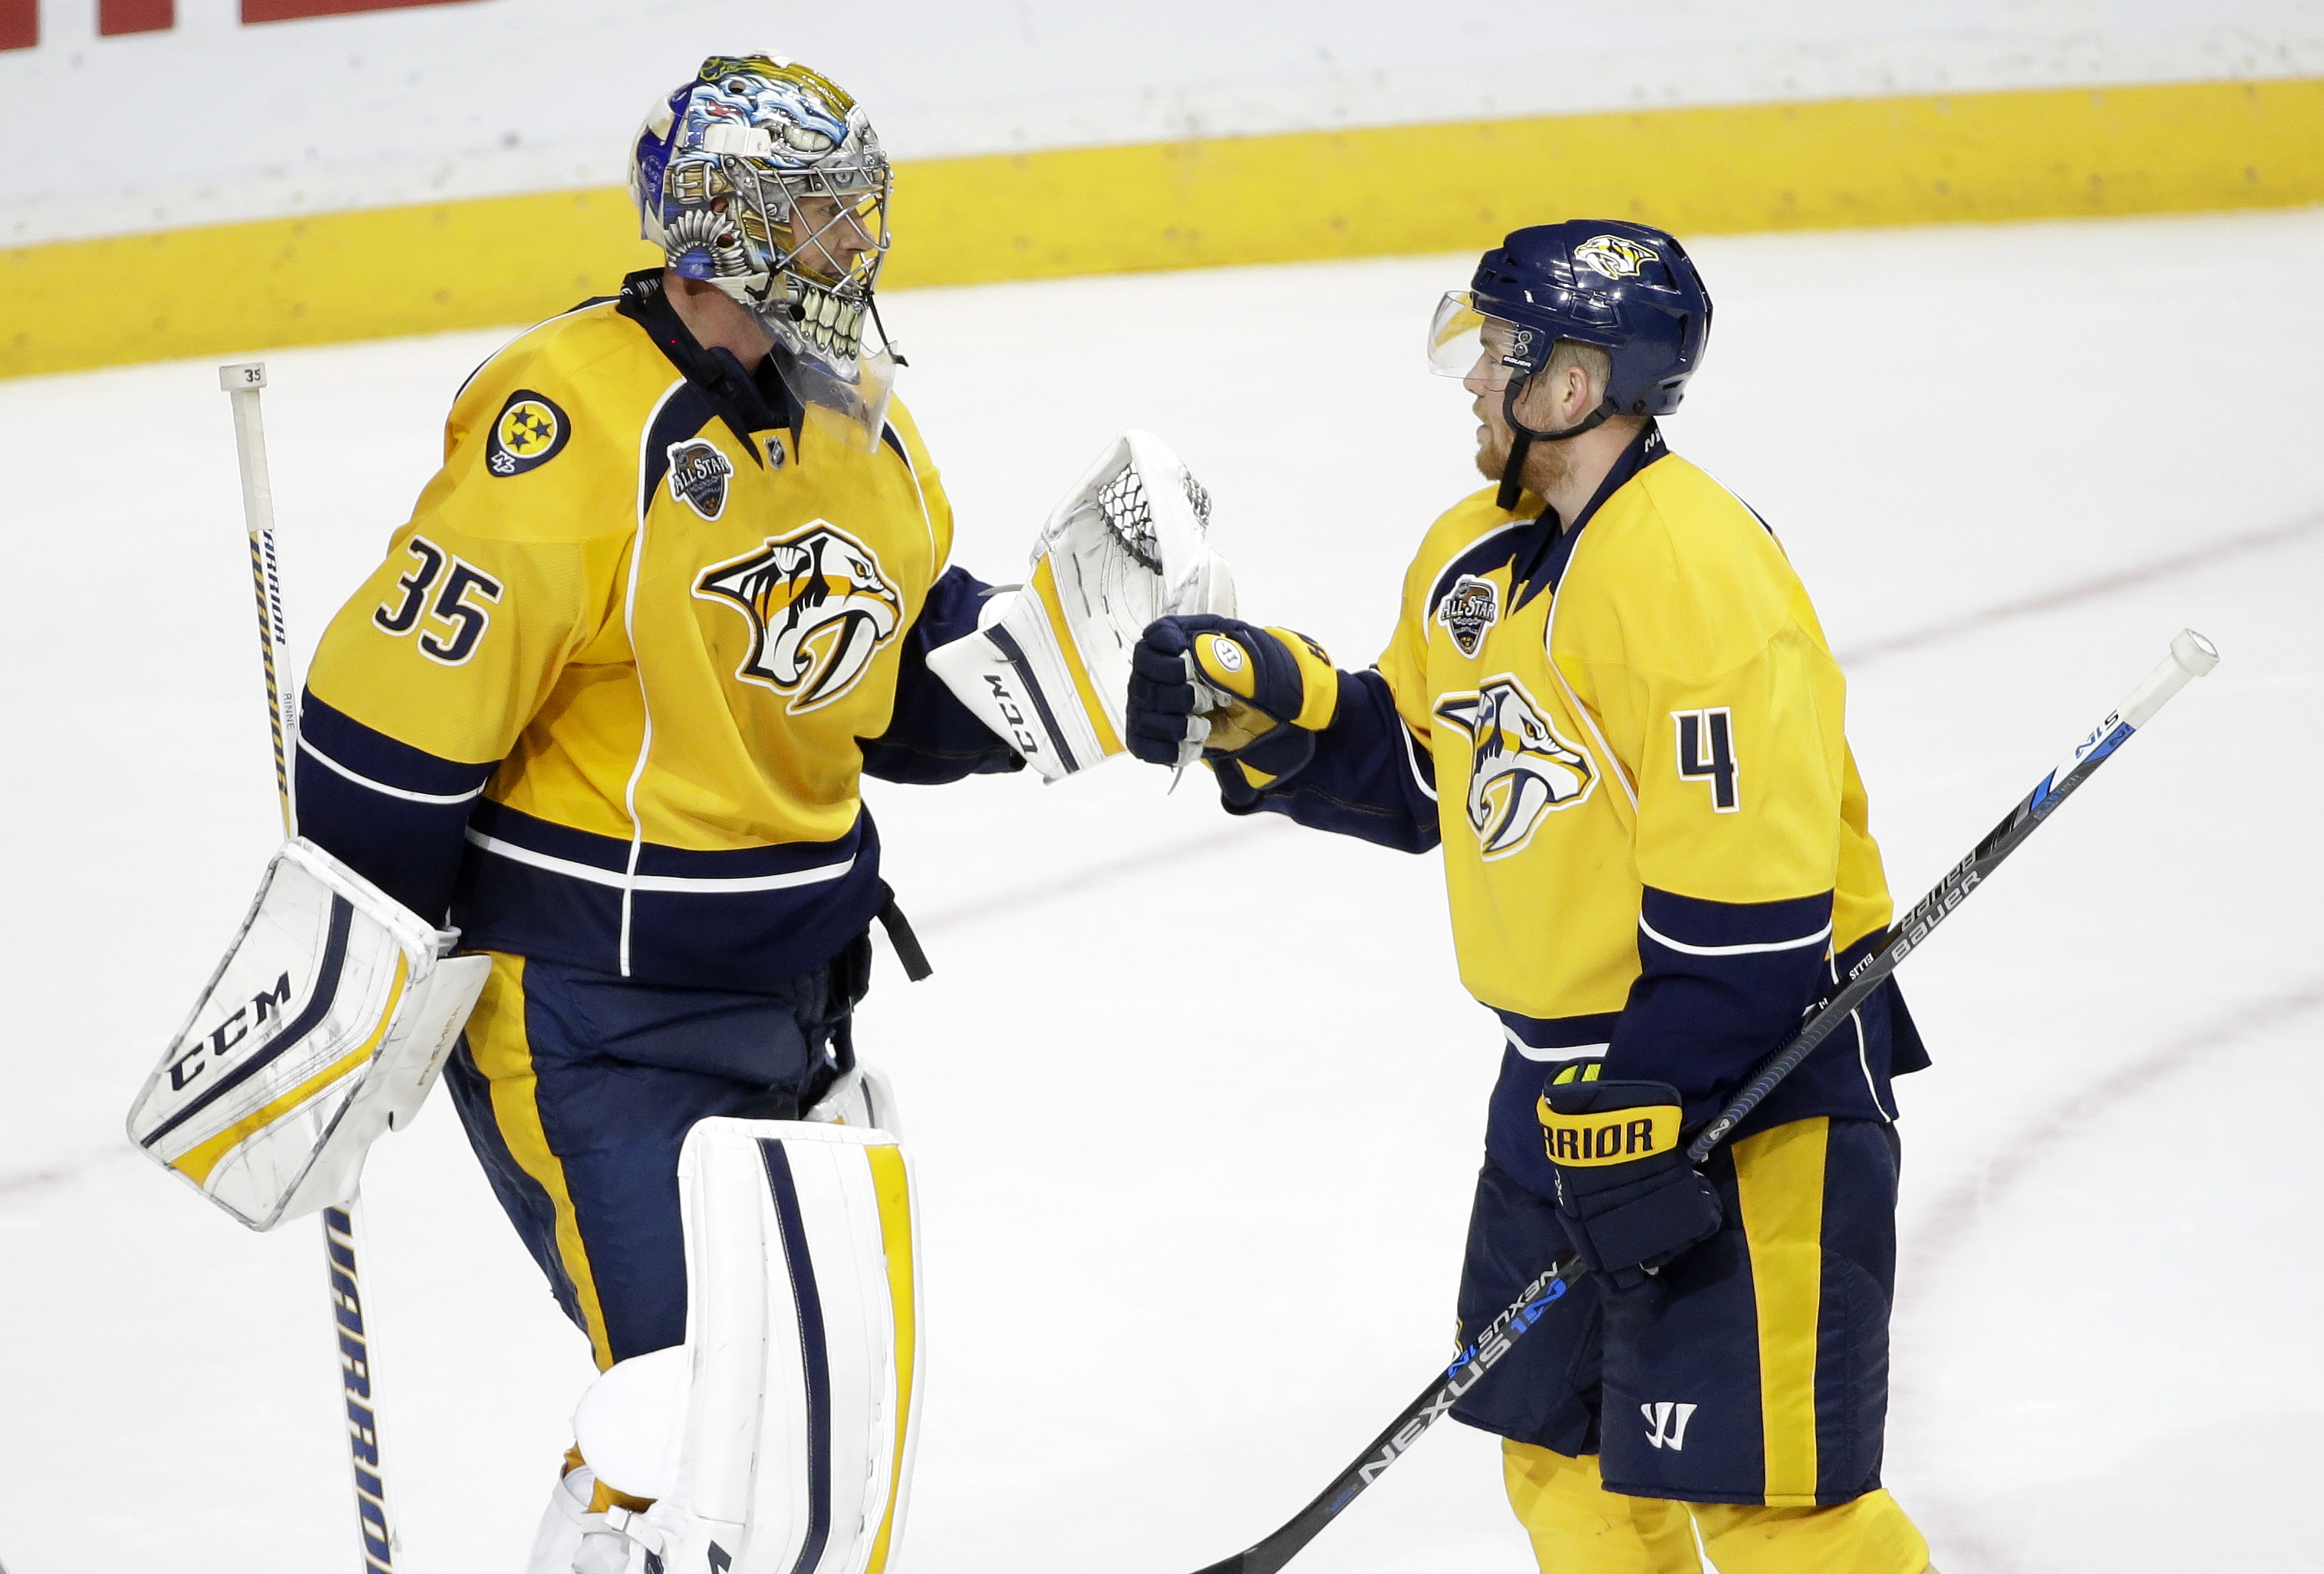 Nashville Predators defenseman Ryan Ellis (4) congratulates goalie Pekka Rinne (35), of Finland, after defeating the Anaheim Ducks 5-1 in an NHL hockey game Thursday, Oct. 22, 2015, in Nashville, Tenn. (AP Photo/Mark Humphrey)